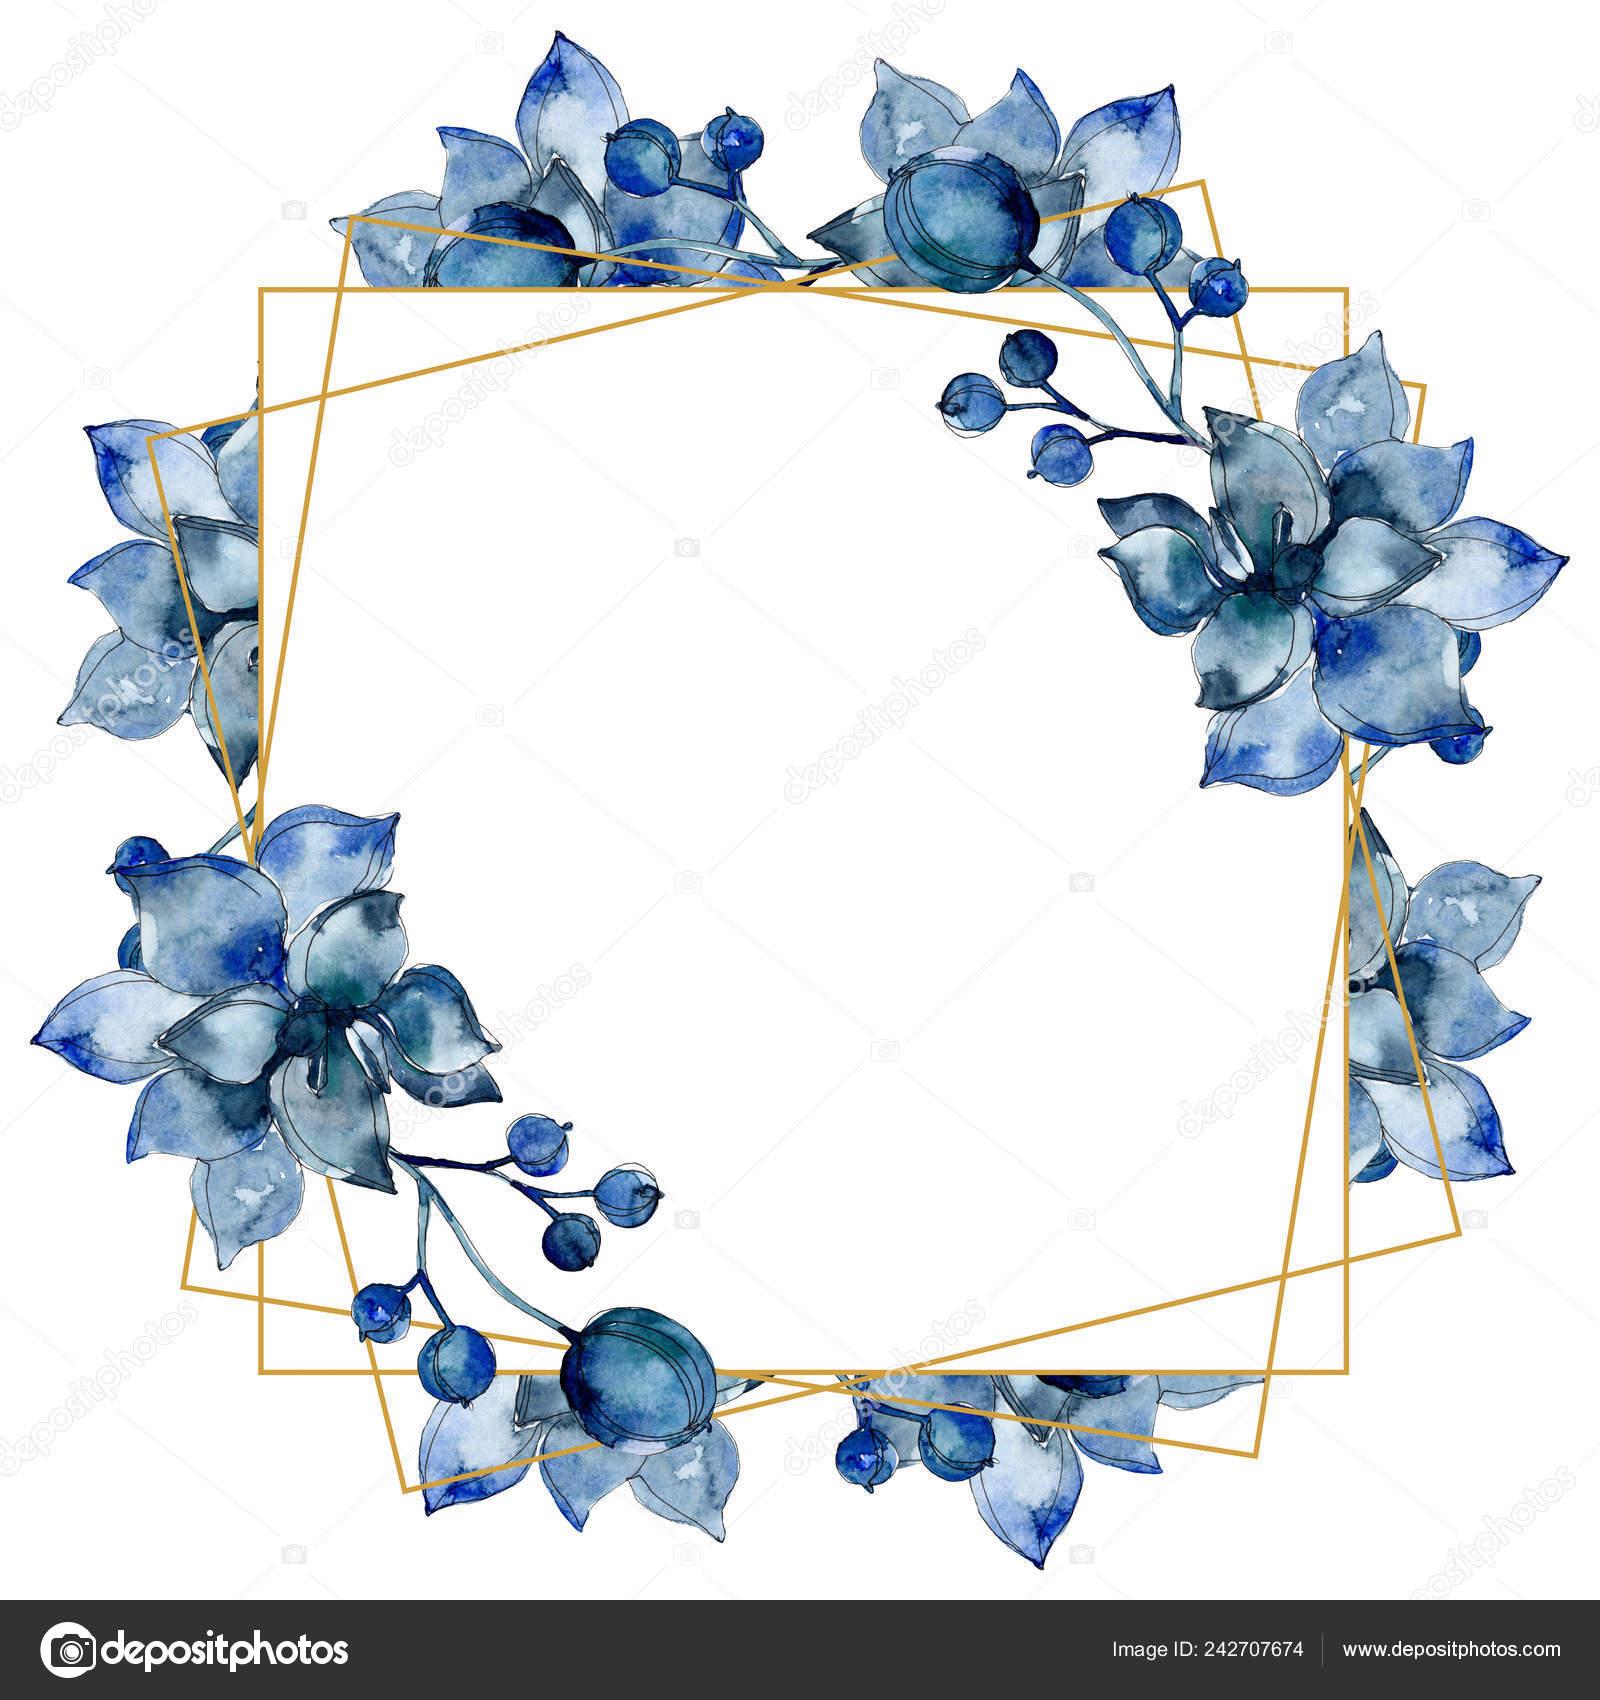 Succulent Botanical Flowers Watercolor Background Illustration Set Frame Border Ornament Stock Photo Image By C Andreyanush 242707674